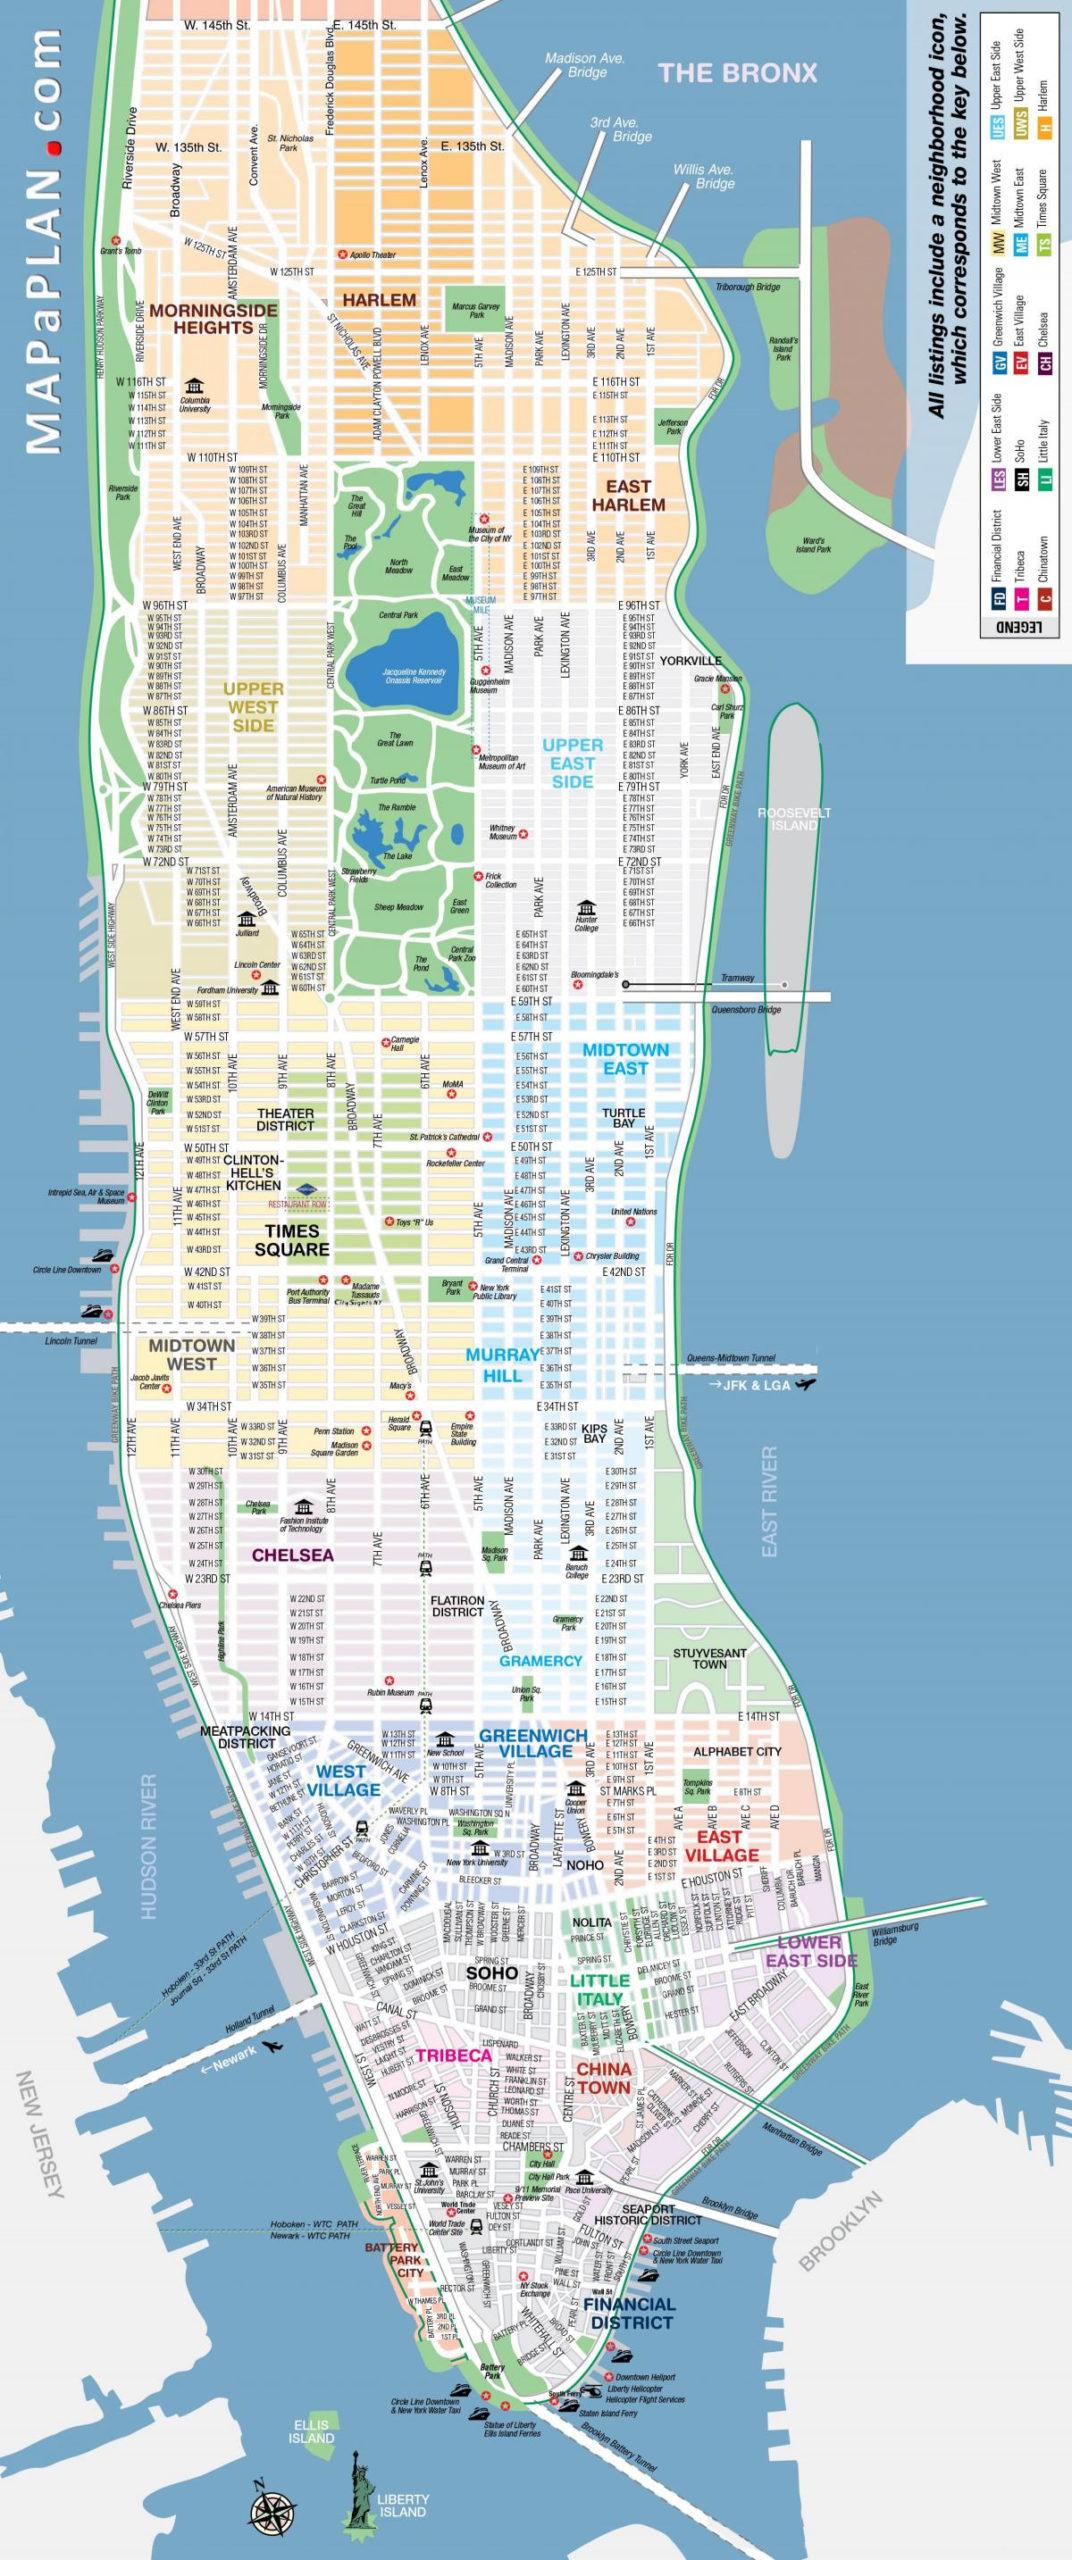 Printable Map Of Manhattan Free Printable Map Of